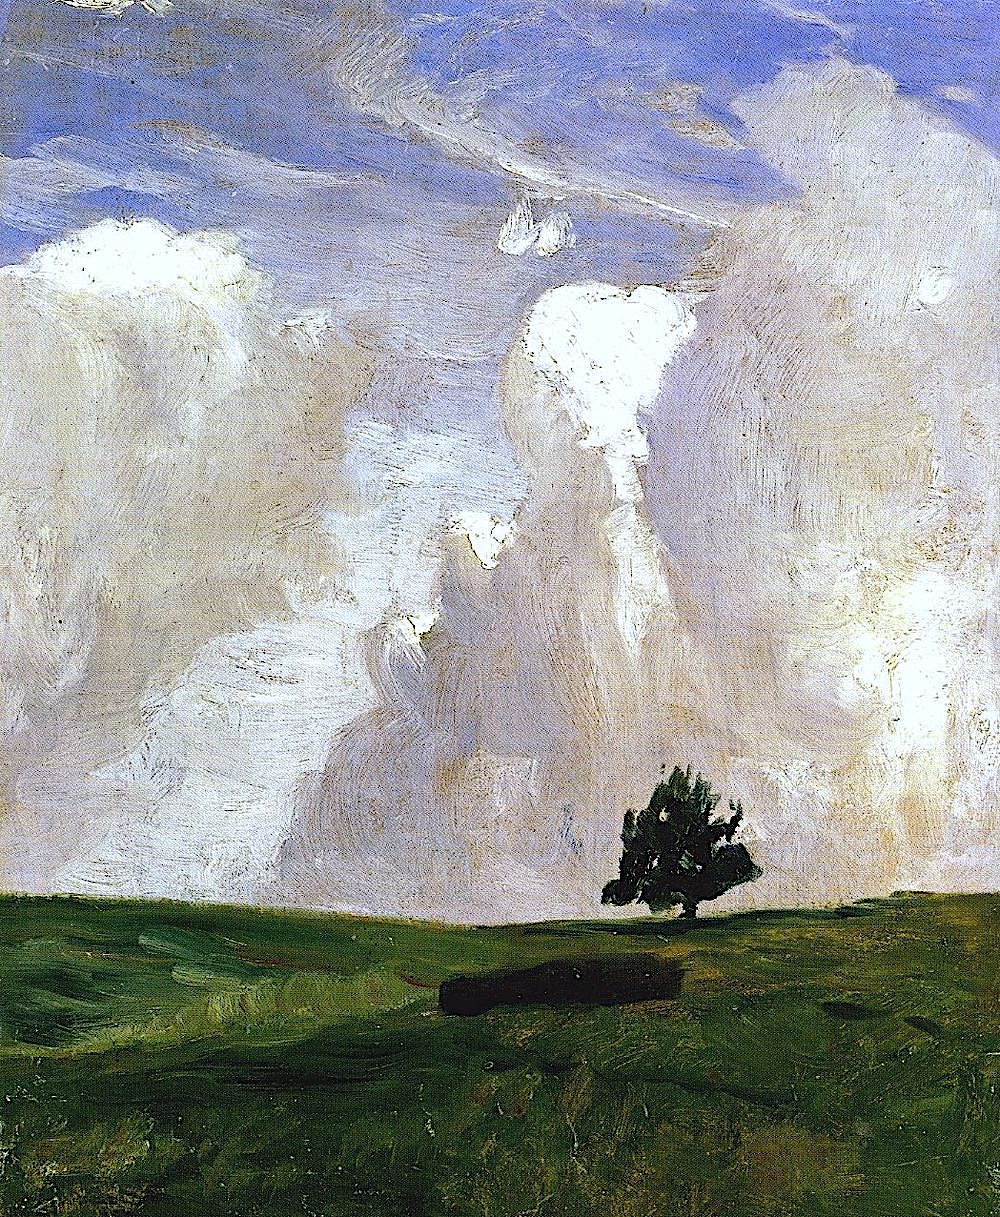 Otto Modersohn 1900s art, a tree